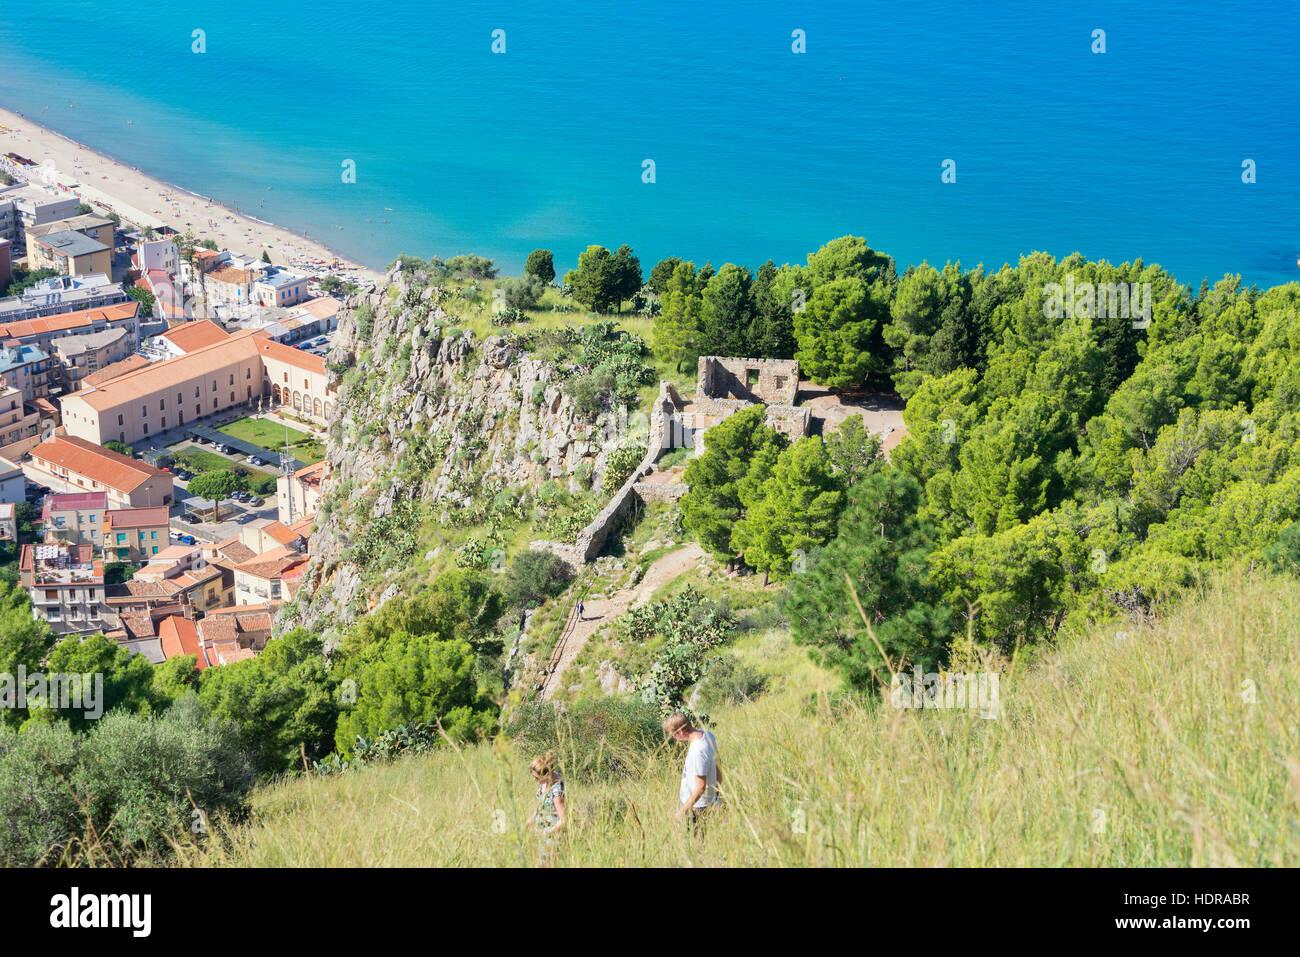 La Rocca, Cefalù, Sicile, Italie, Europe Photo Stock